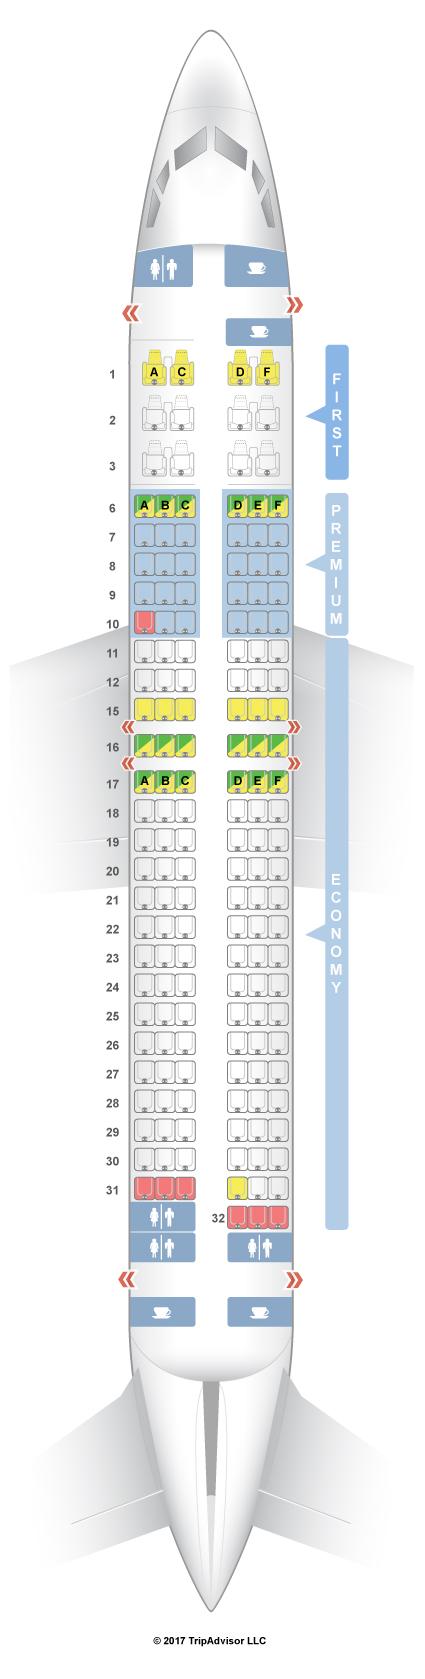 Seatguru seat map alaska airlines boeing 737 800 738 slimline